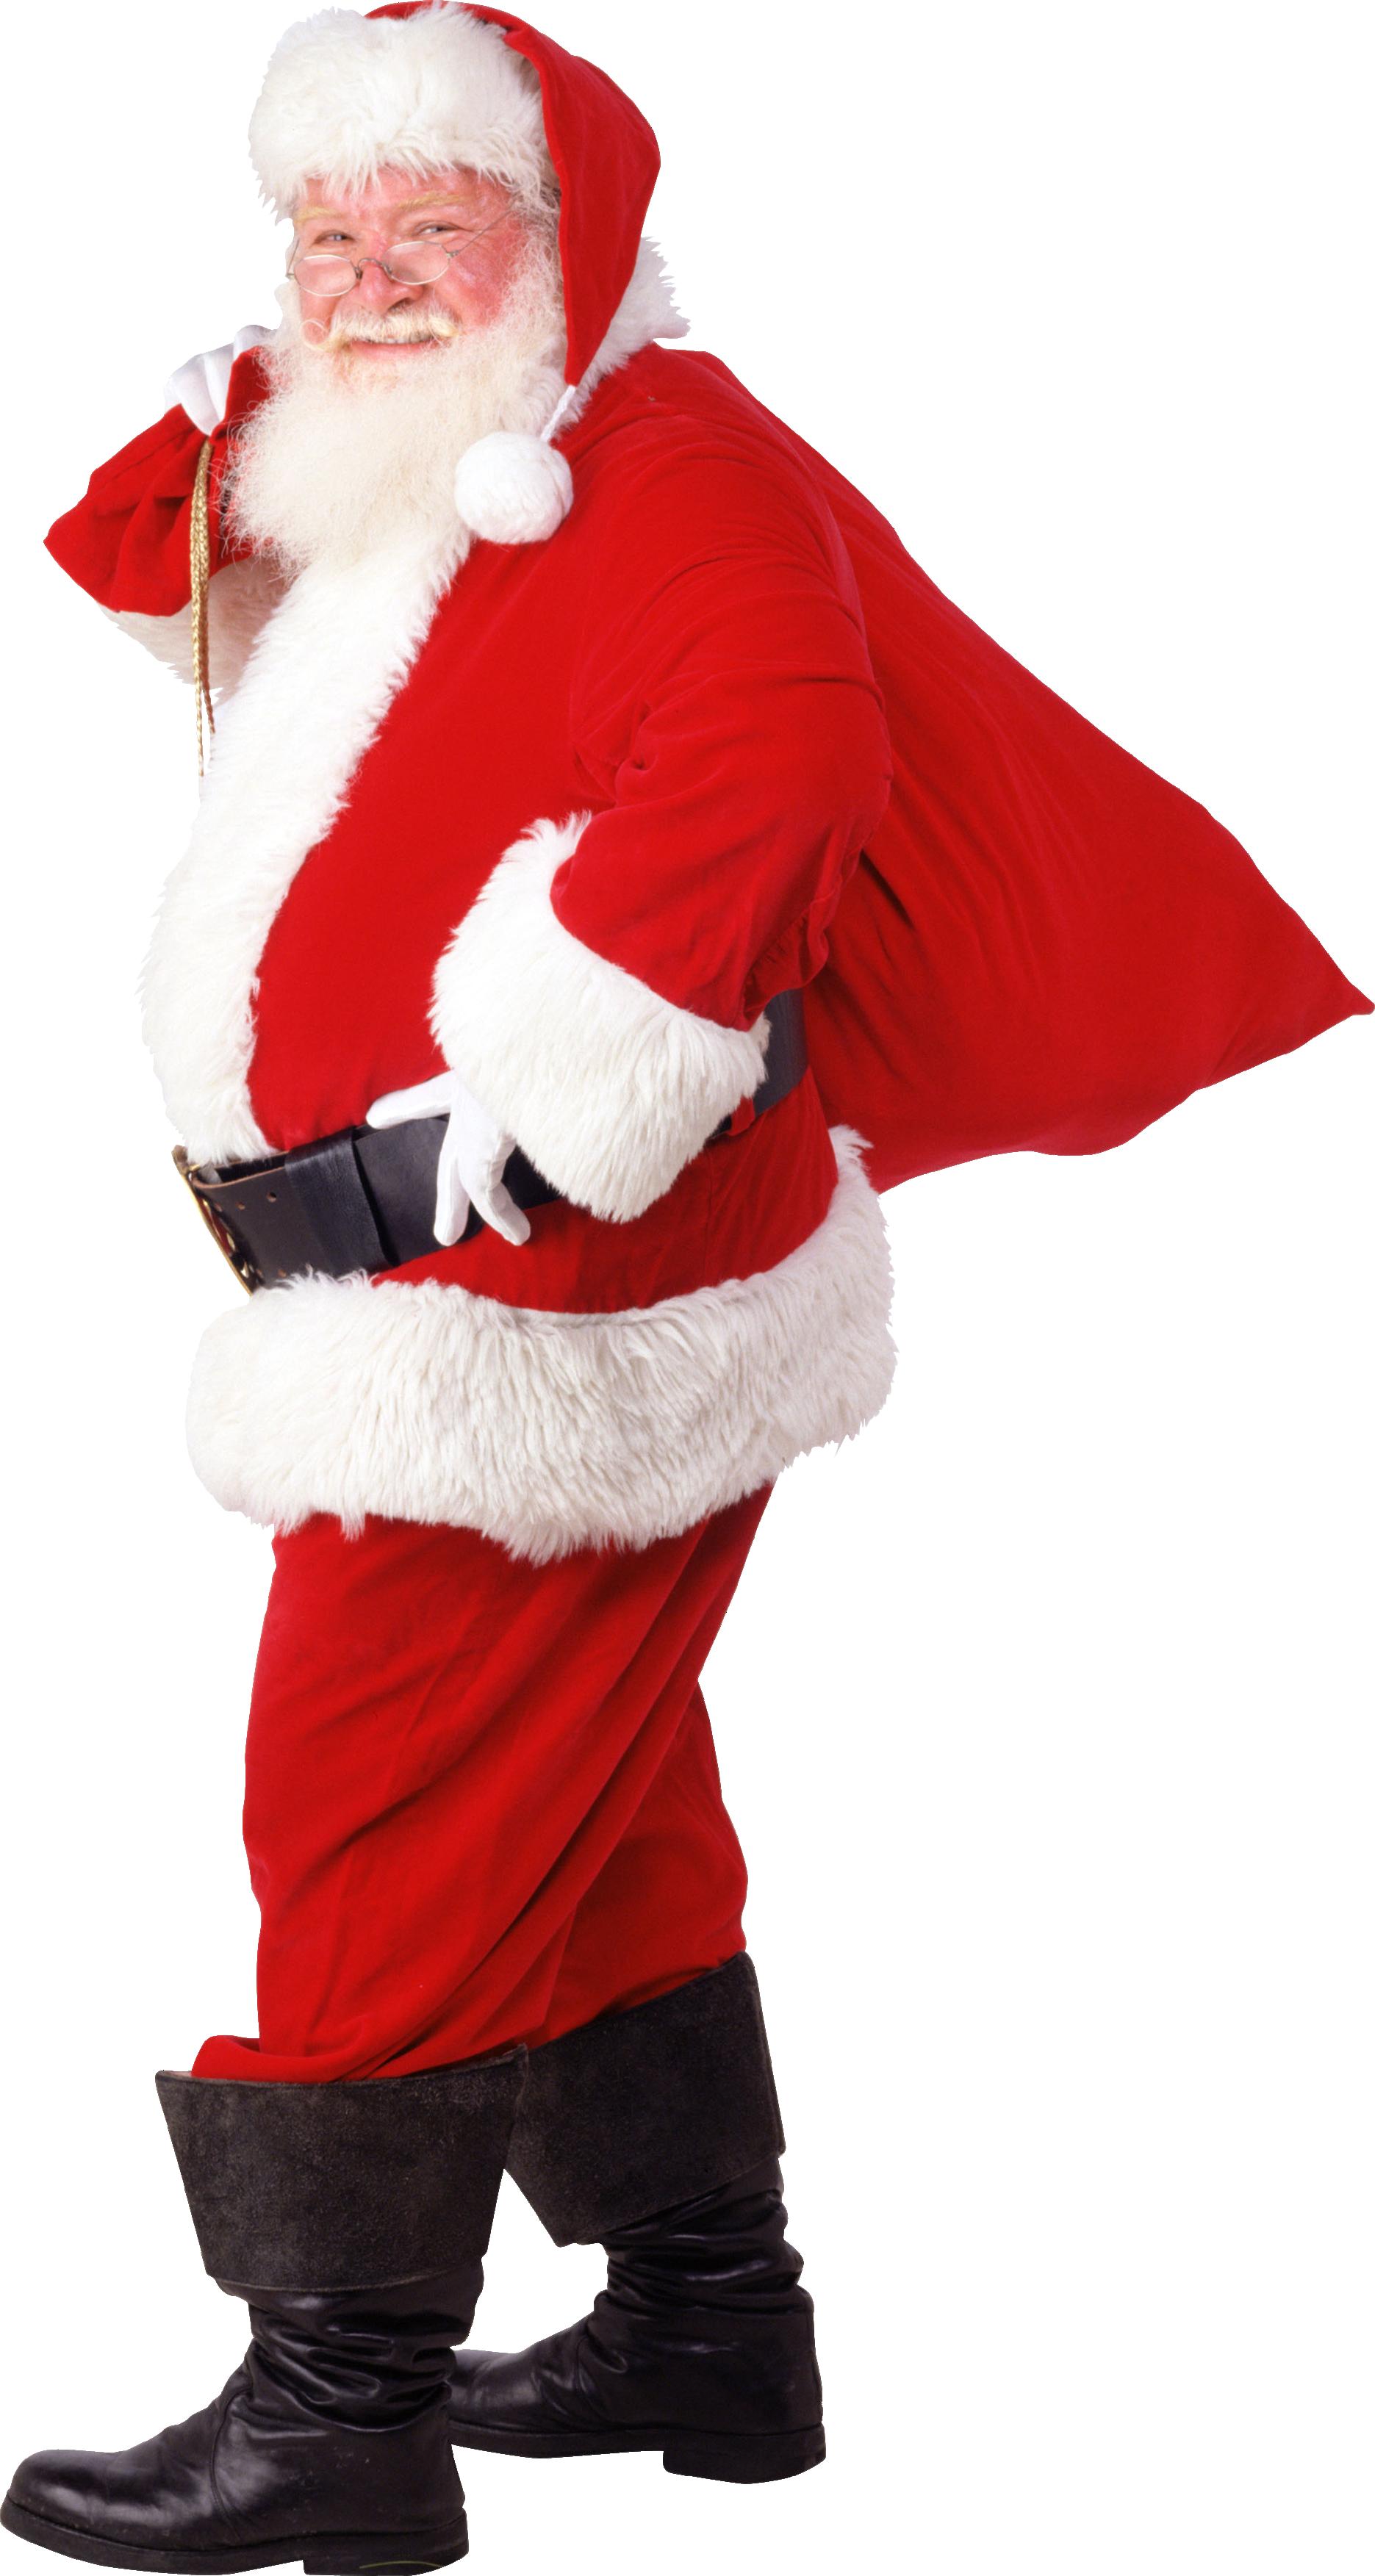 Santa Claus PNG - 12848